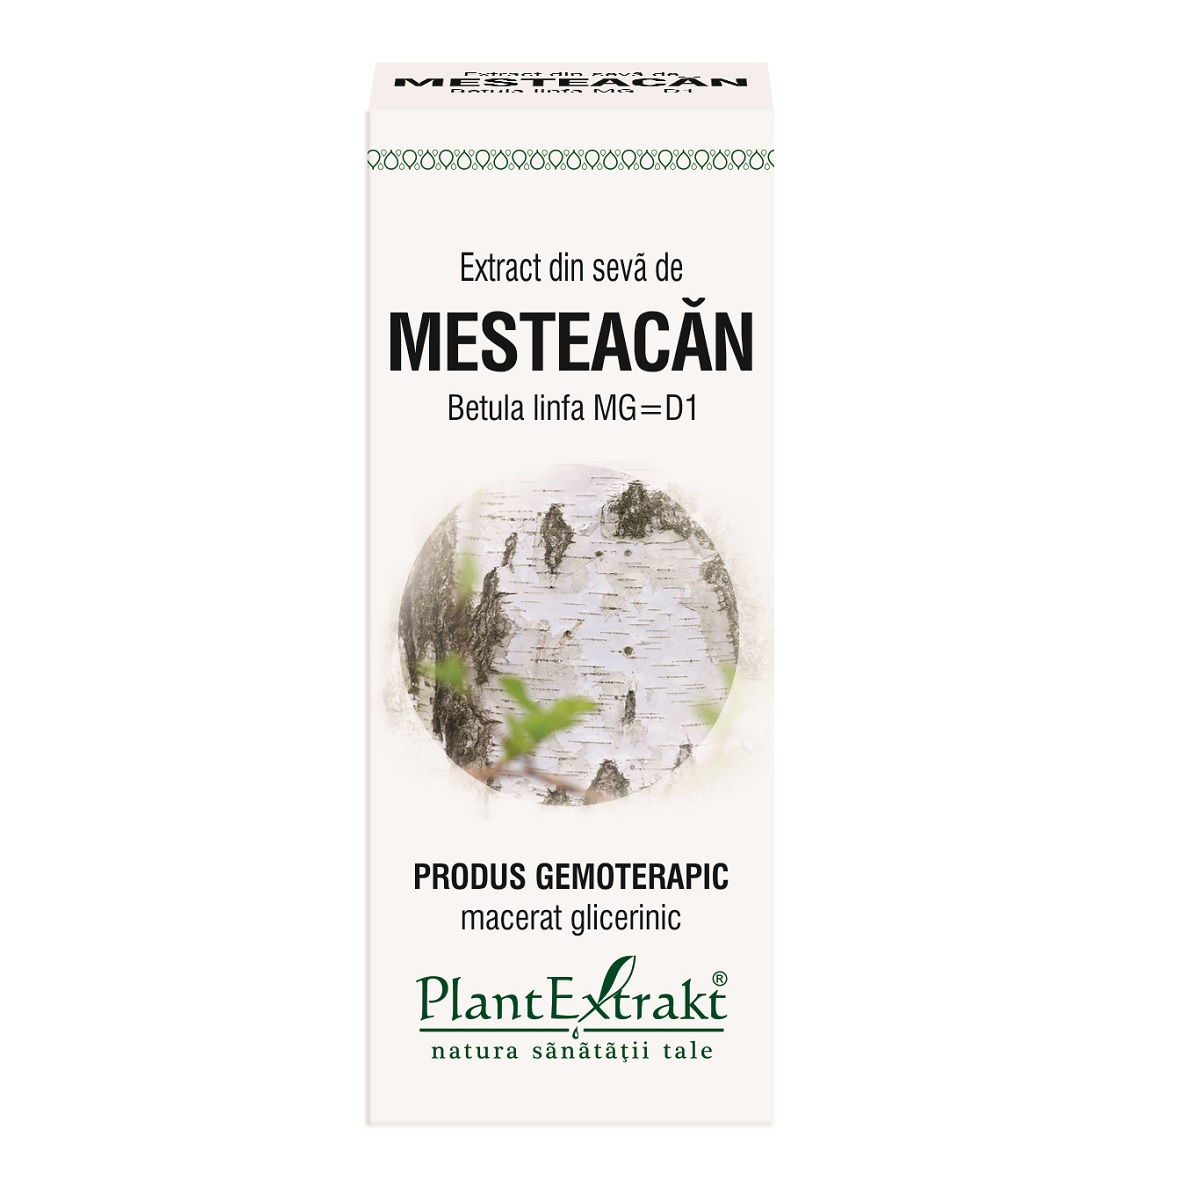 Extract din seva de mesteacan, 50ml, Plant Extrakt drmax.ro